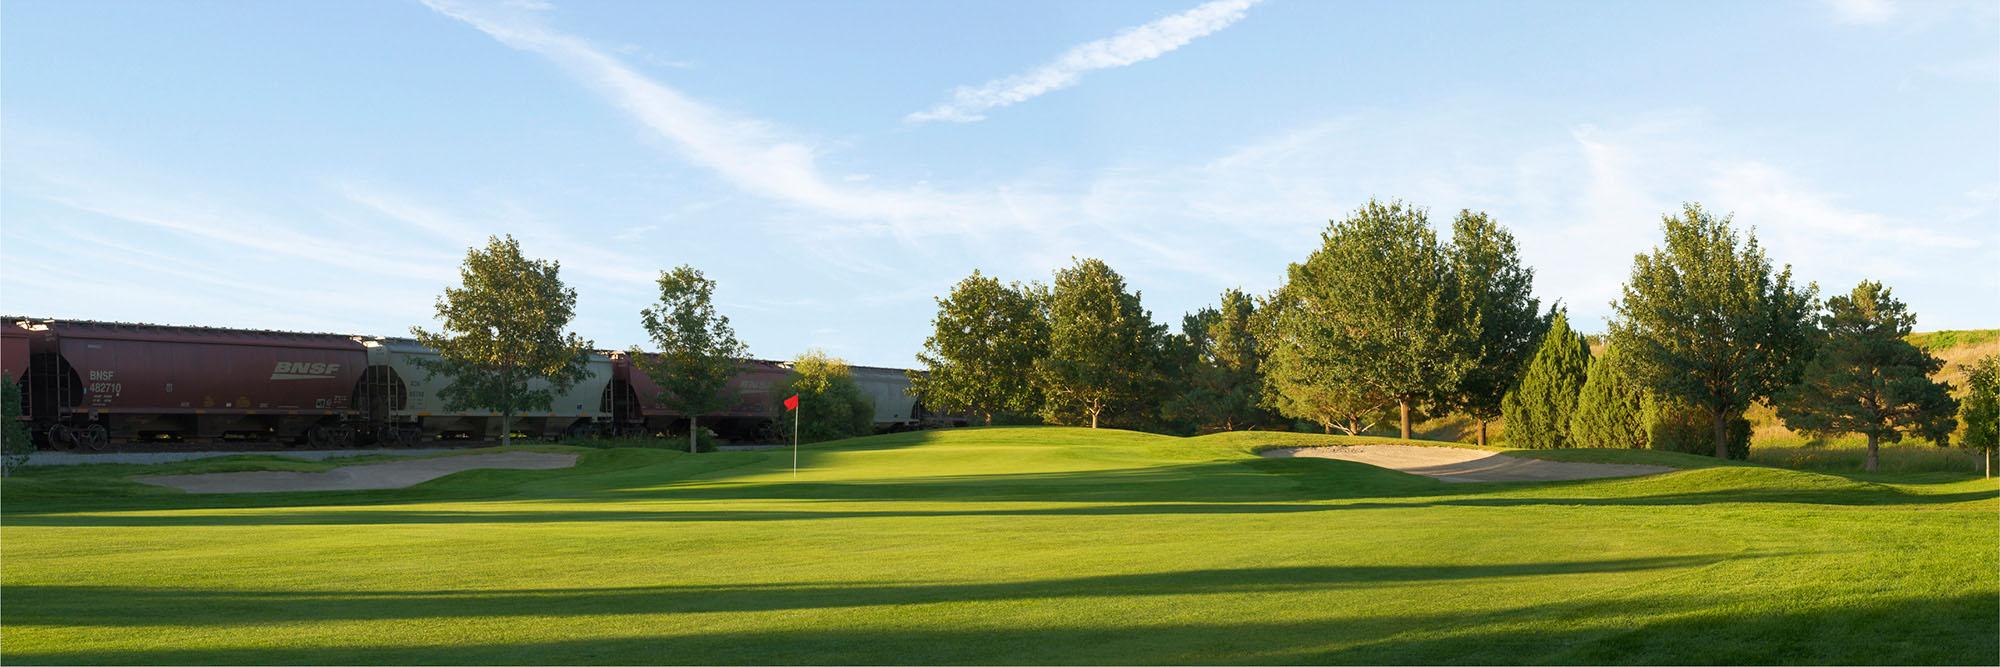 Golf Course Image - Fremont No. 12